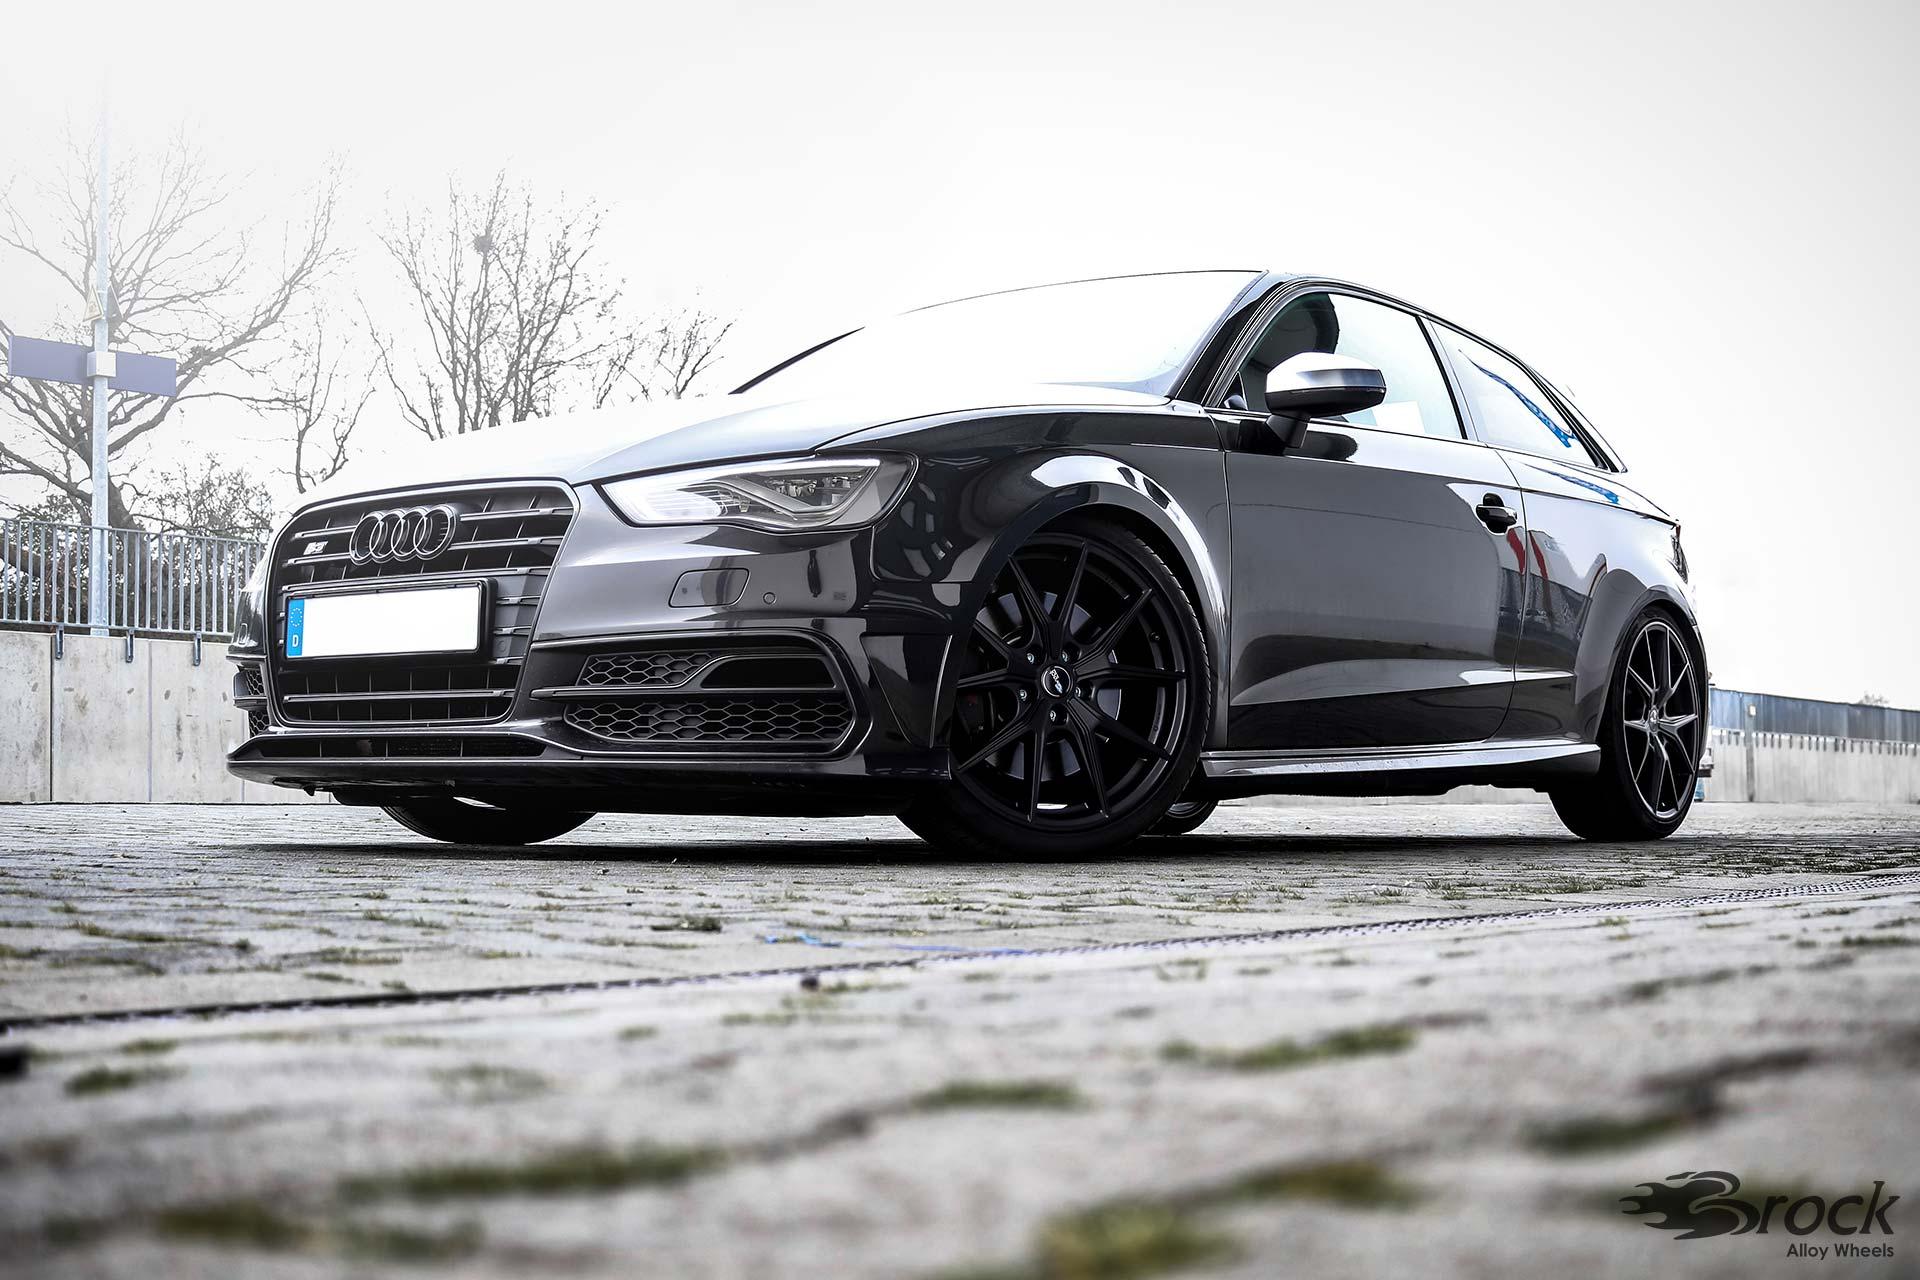 Audi S3 Brock B40 SBM